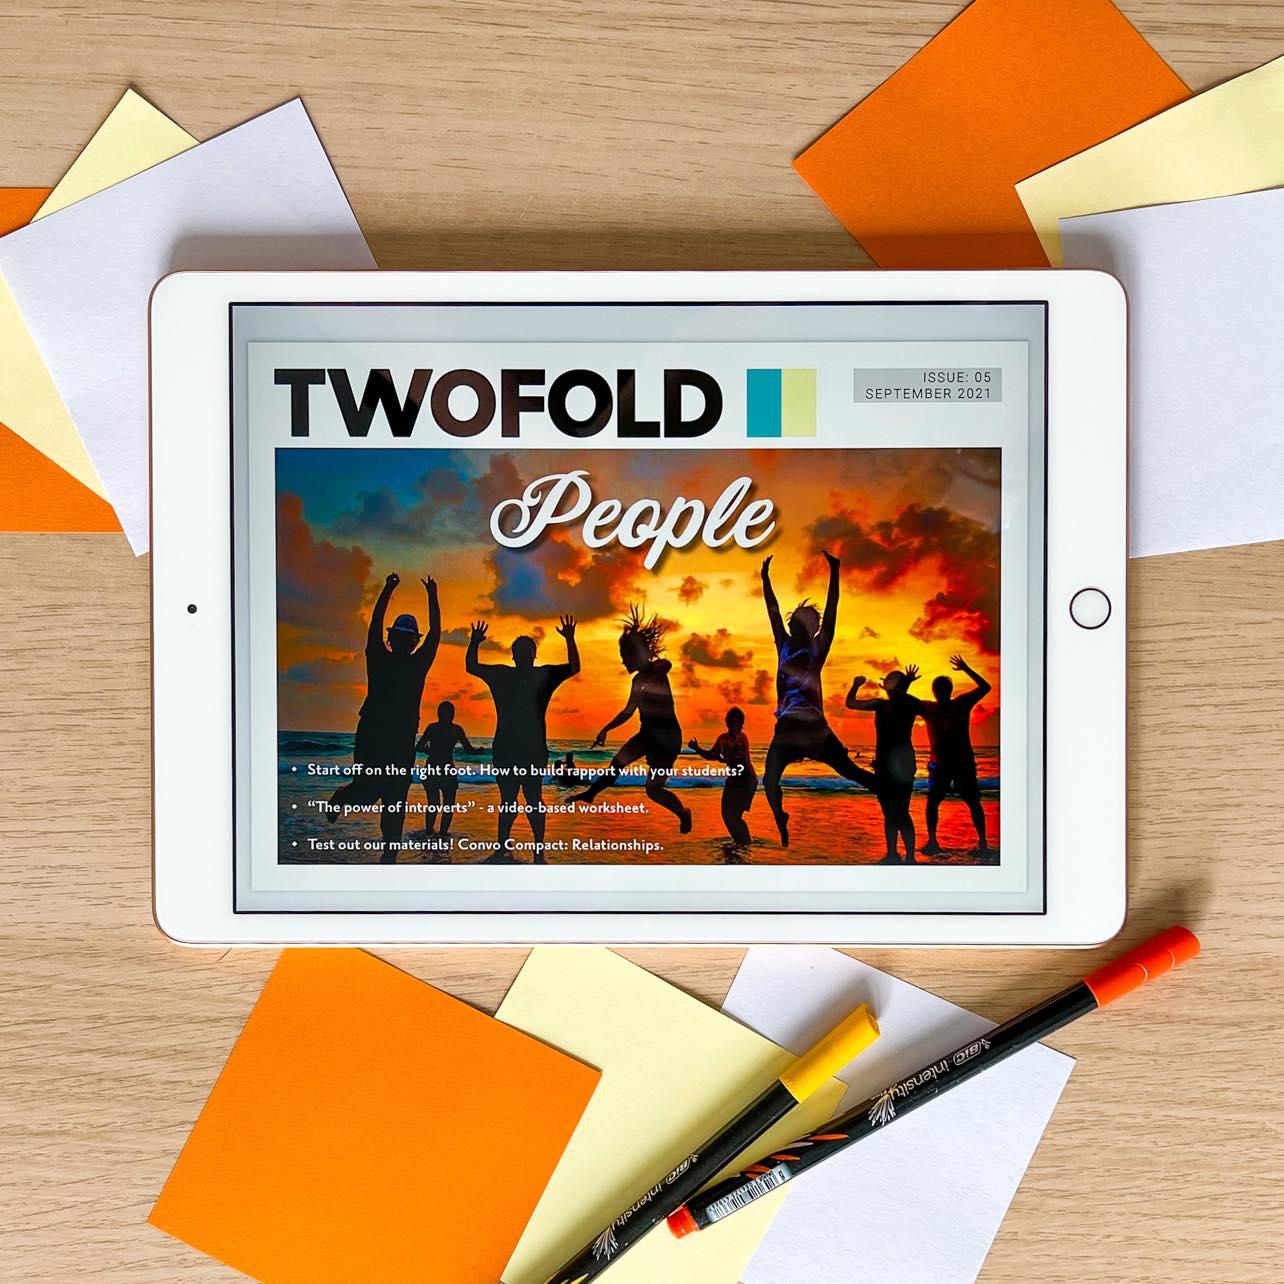 Free Magazine for English teachers